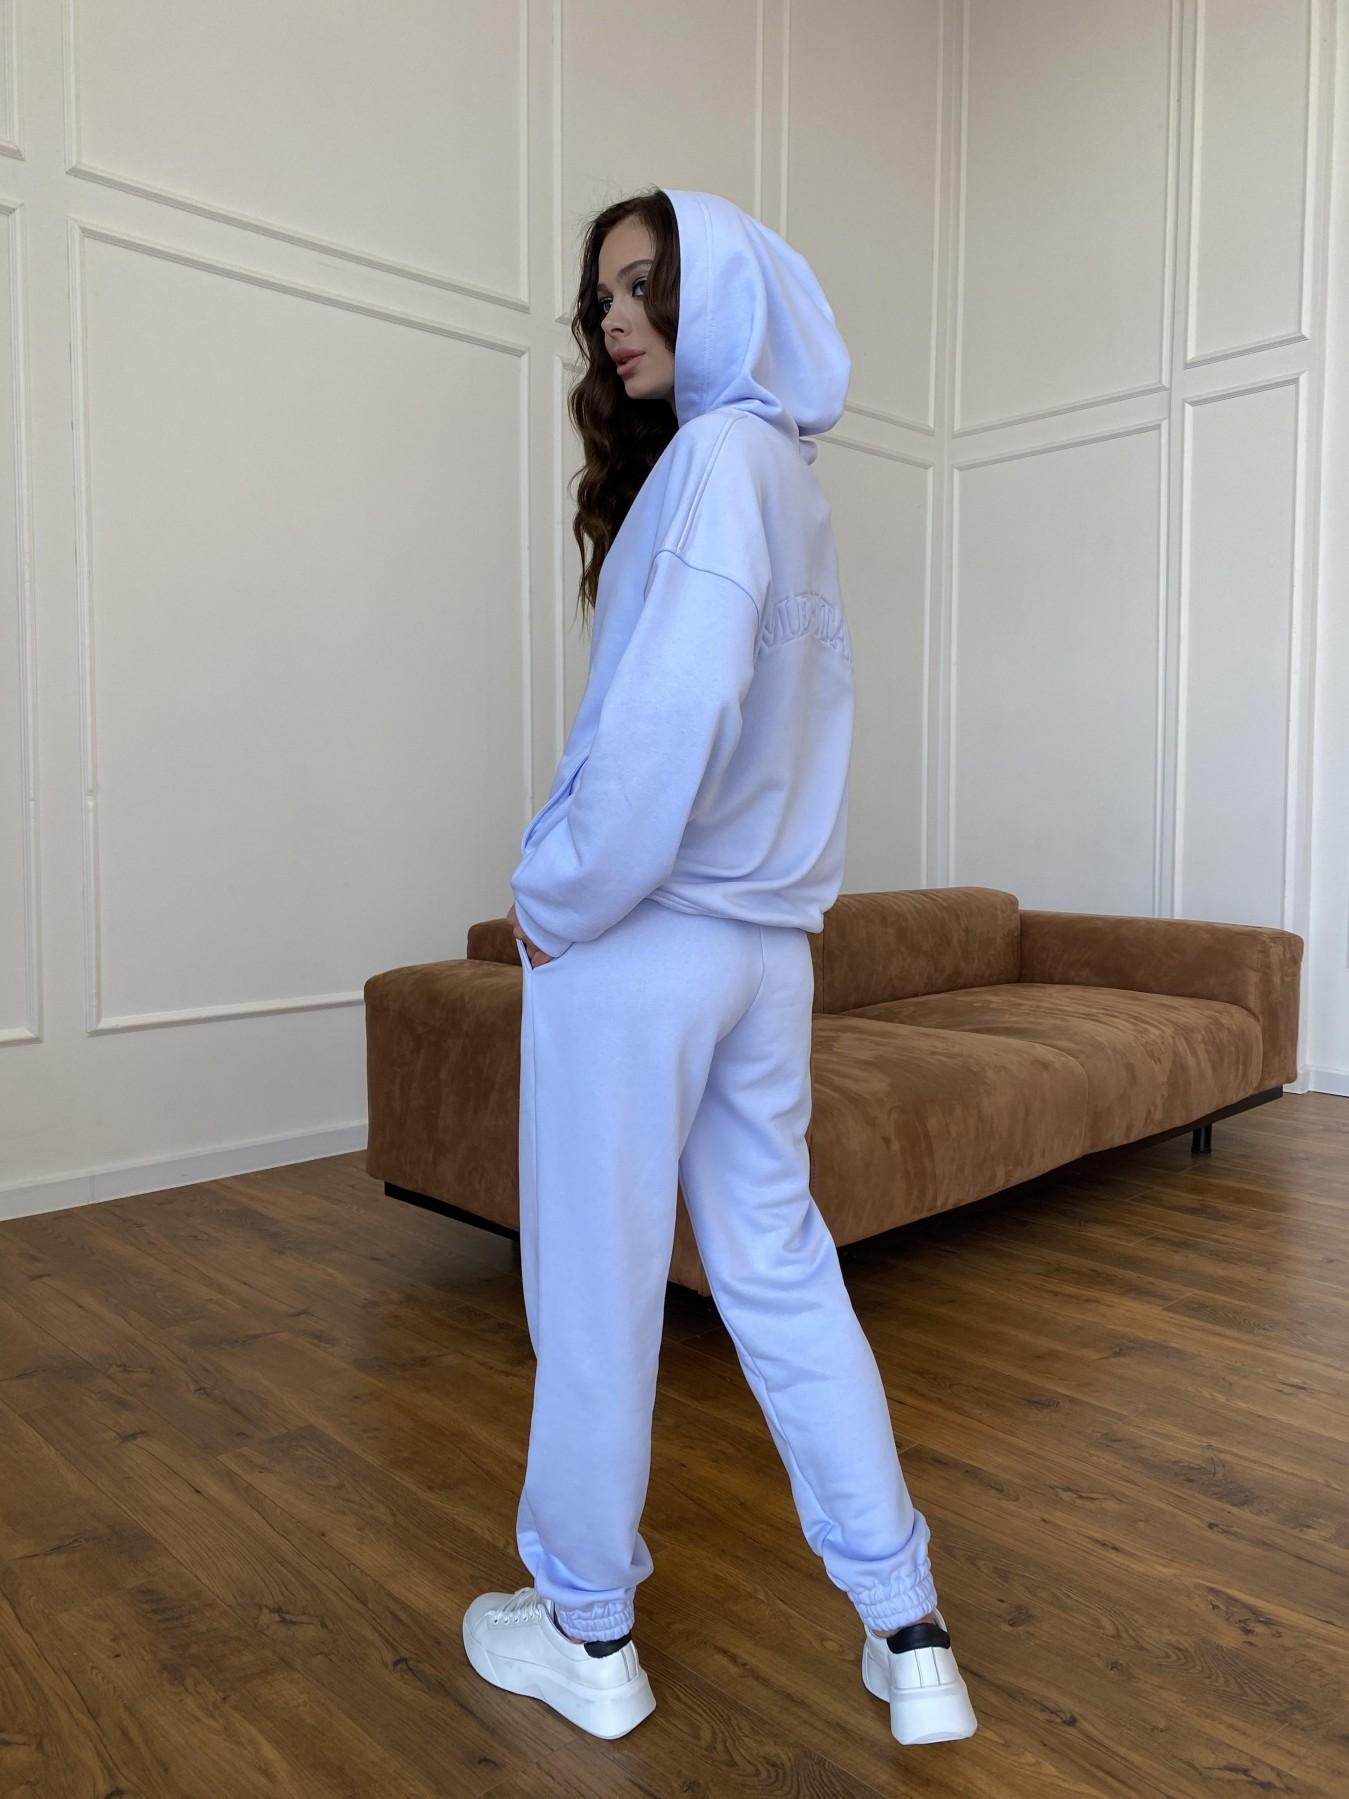 Мечтай костюм  трикотаж 3х нитка 11242 АРТ. 47757 Цвет: Голубой Светлый - фото 6, интернет магазин tm-modus.ru